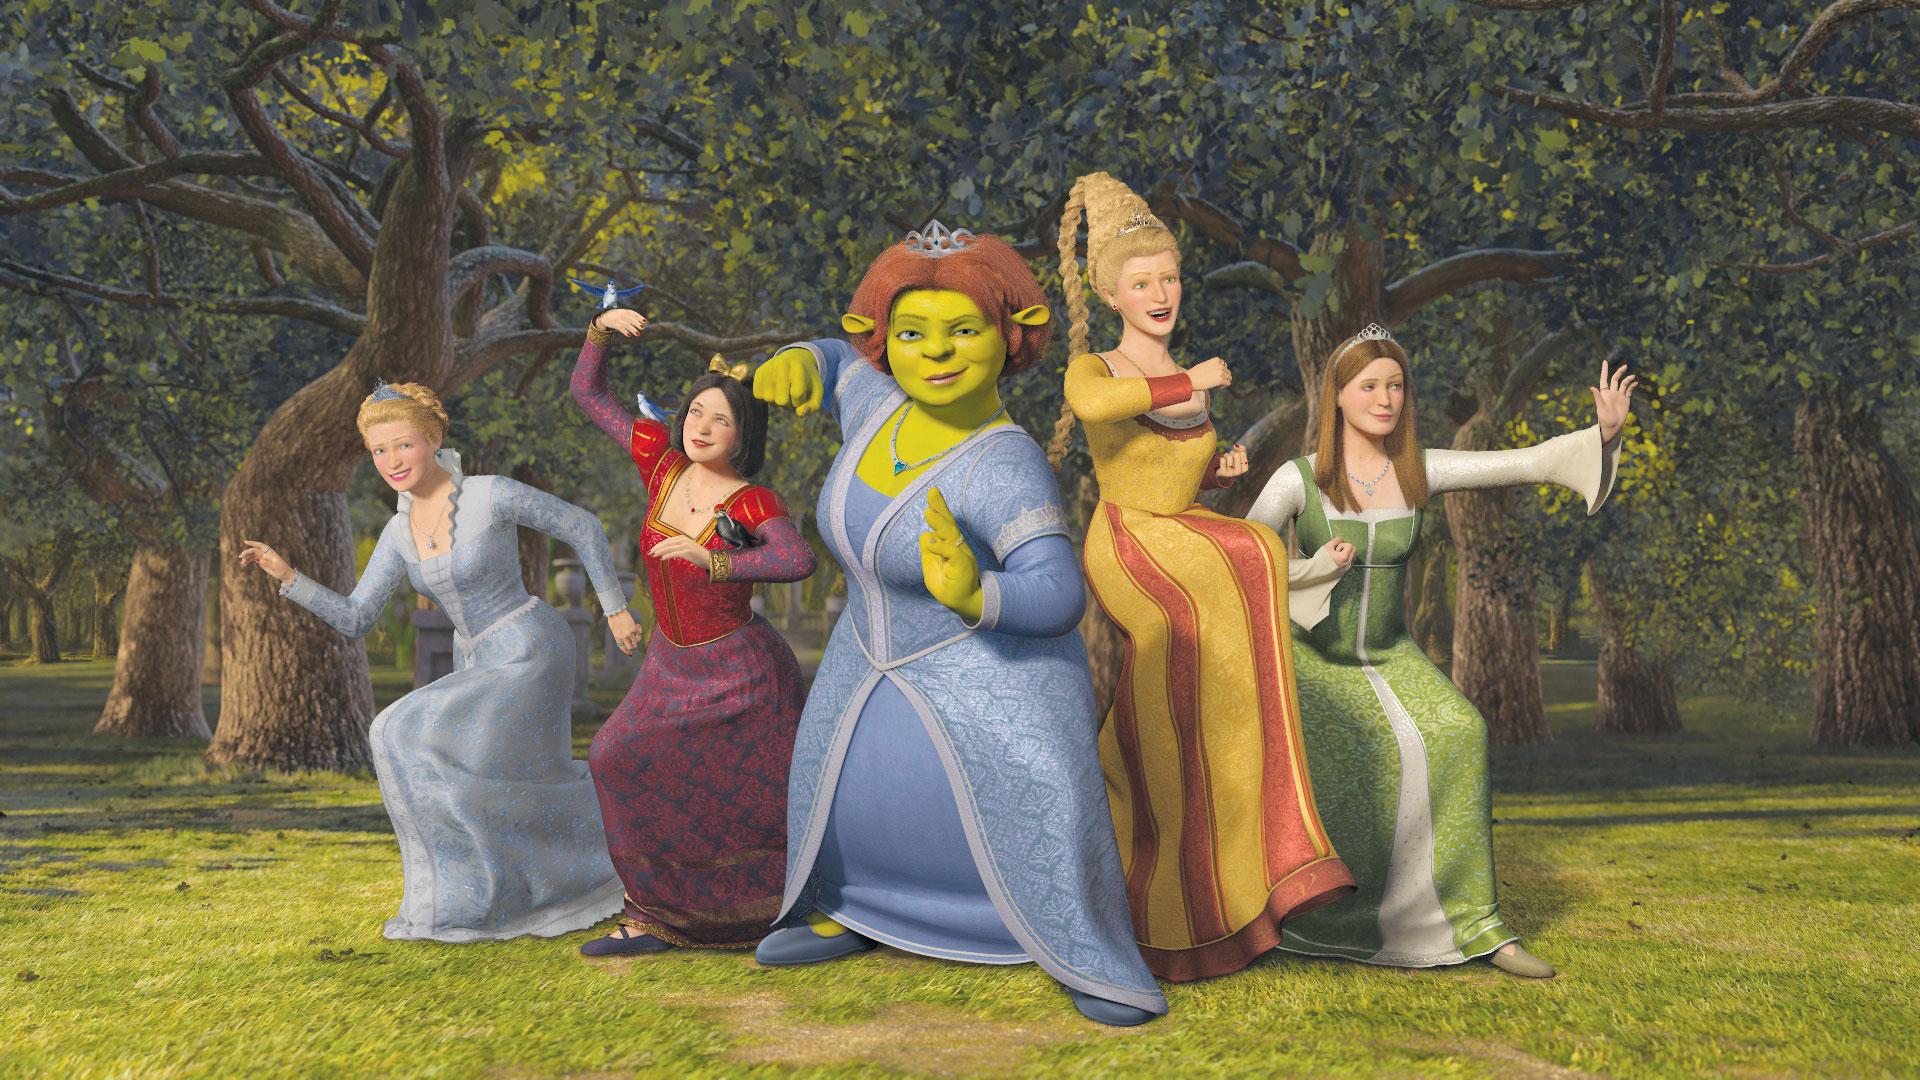 Par Gillossen   le mardi 24 octobre 2006   224  09 54 11Shrek 3 Fiona